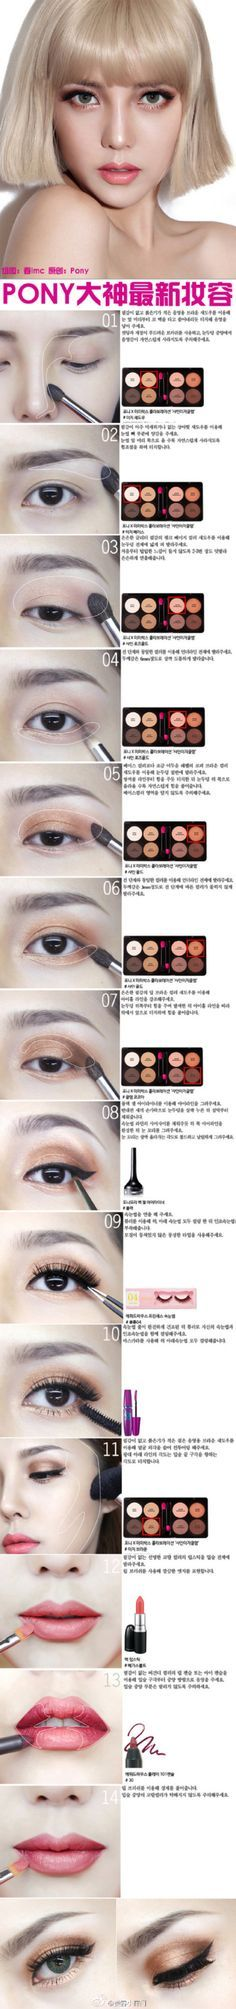 makeup step by step tutorial by Pony #koreanmakeup